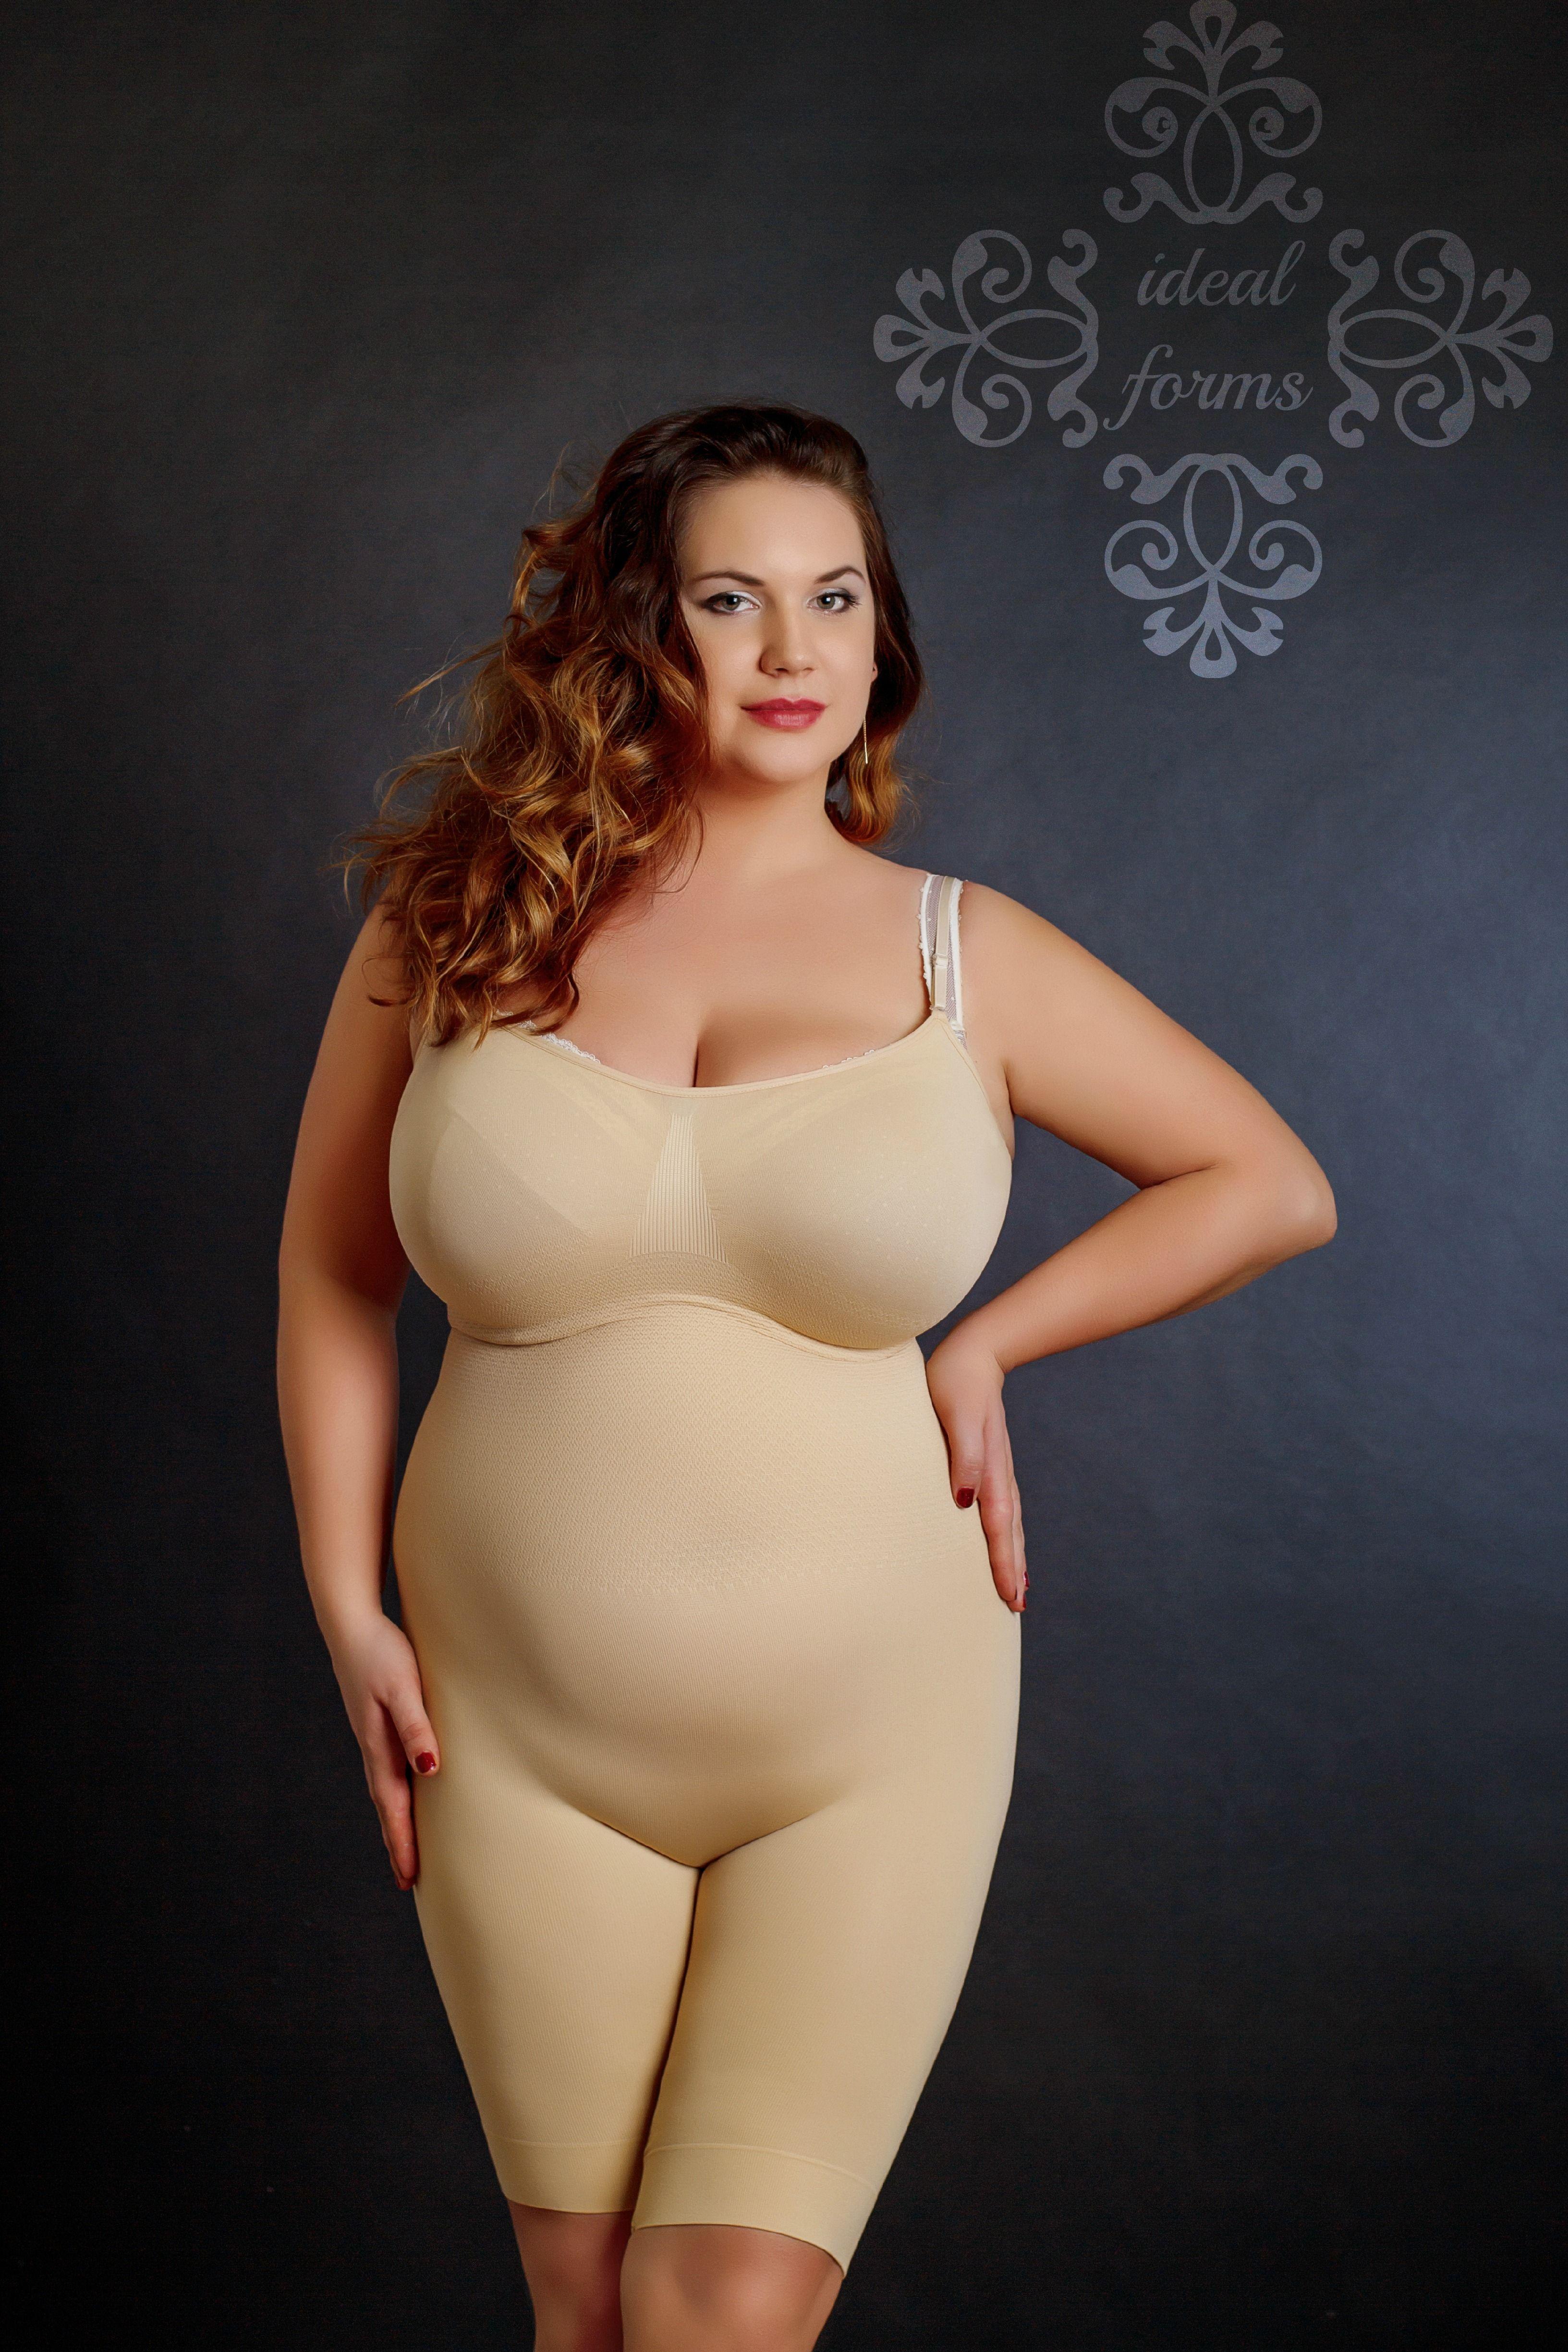 big boobs nude image.com